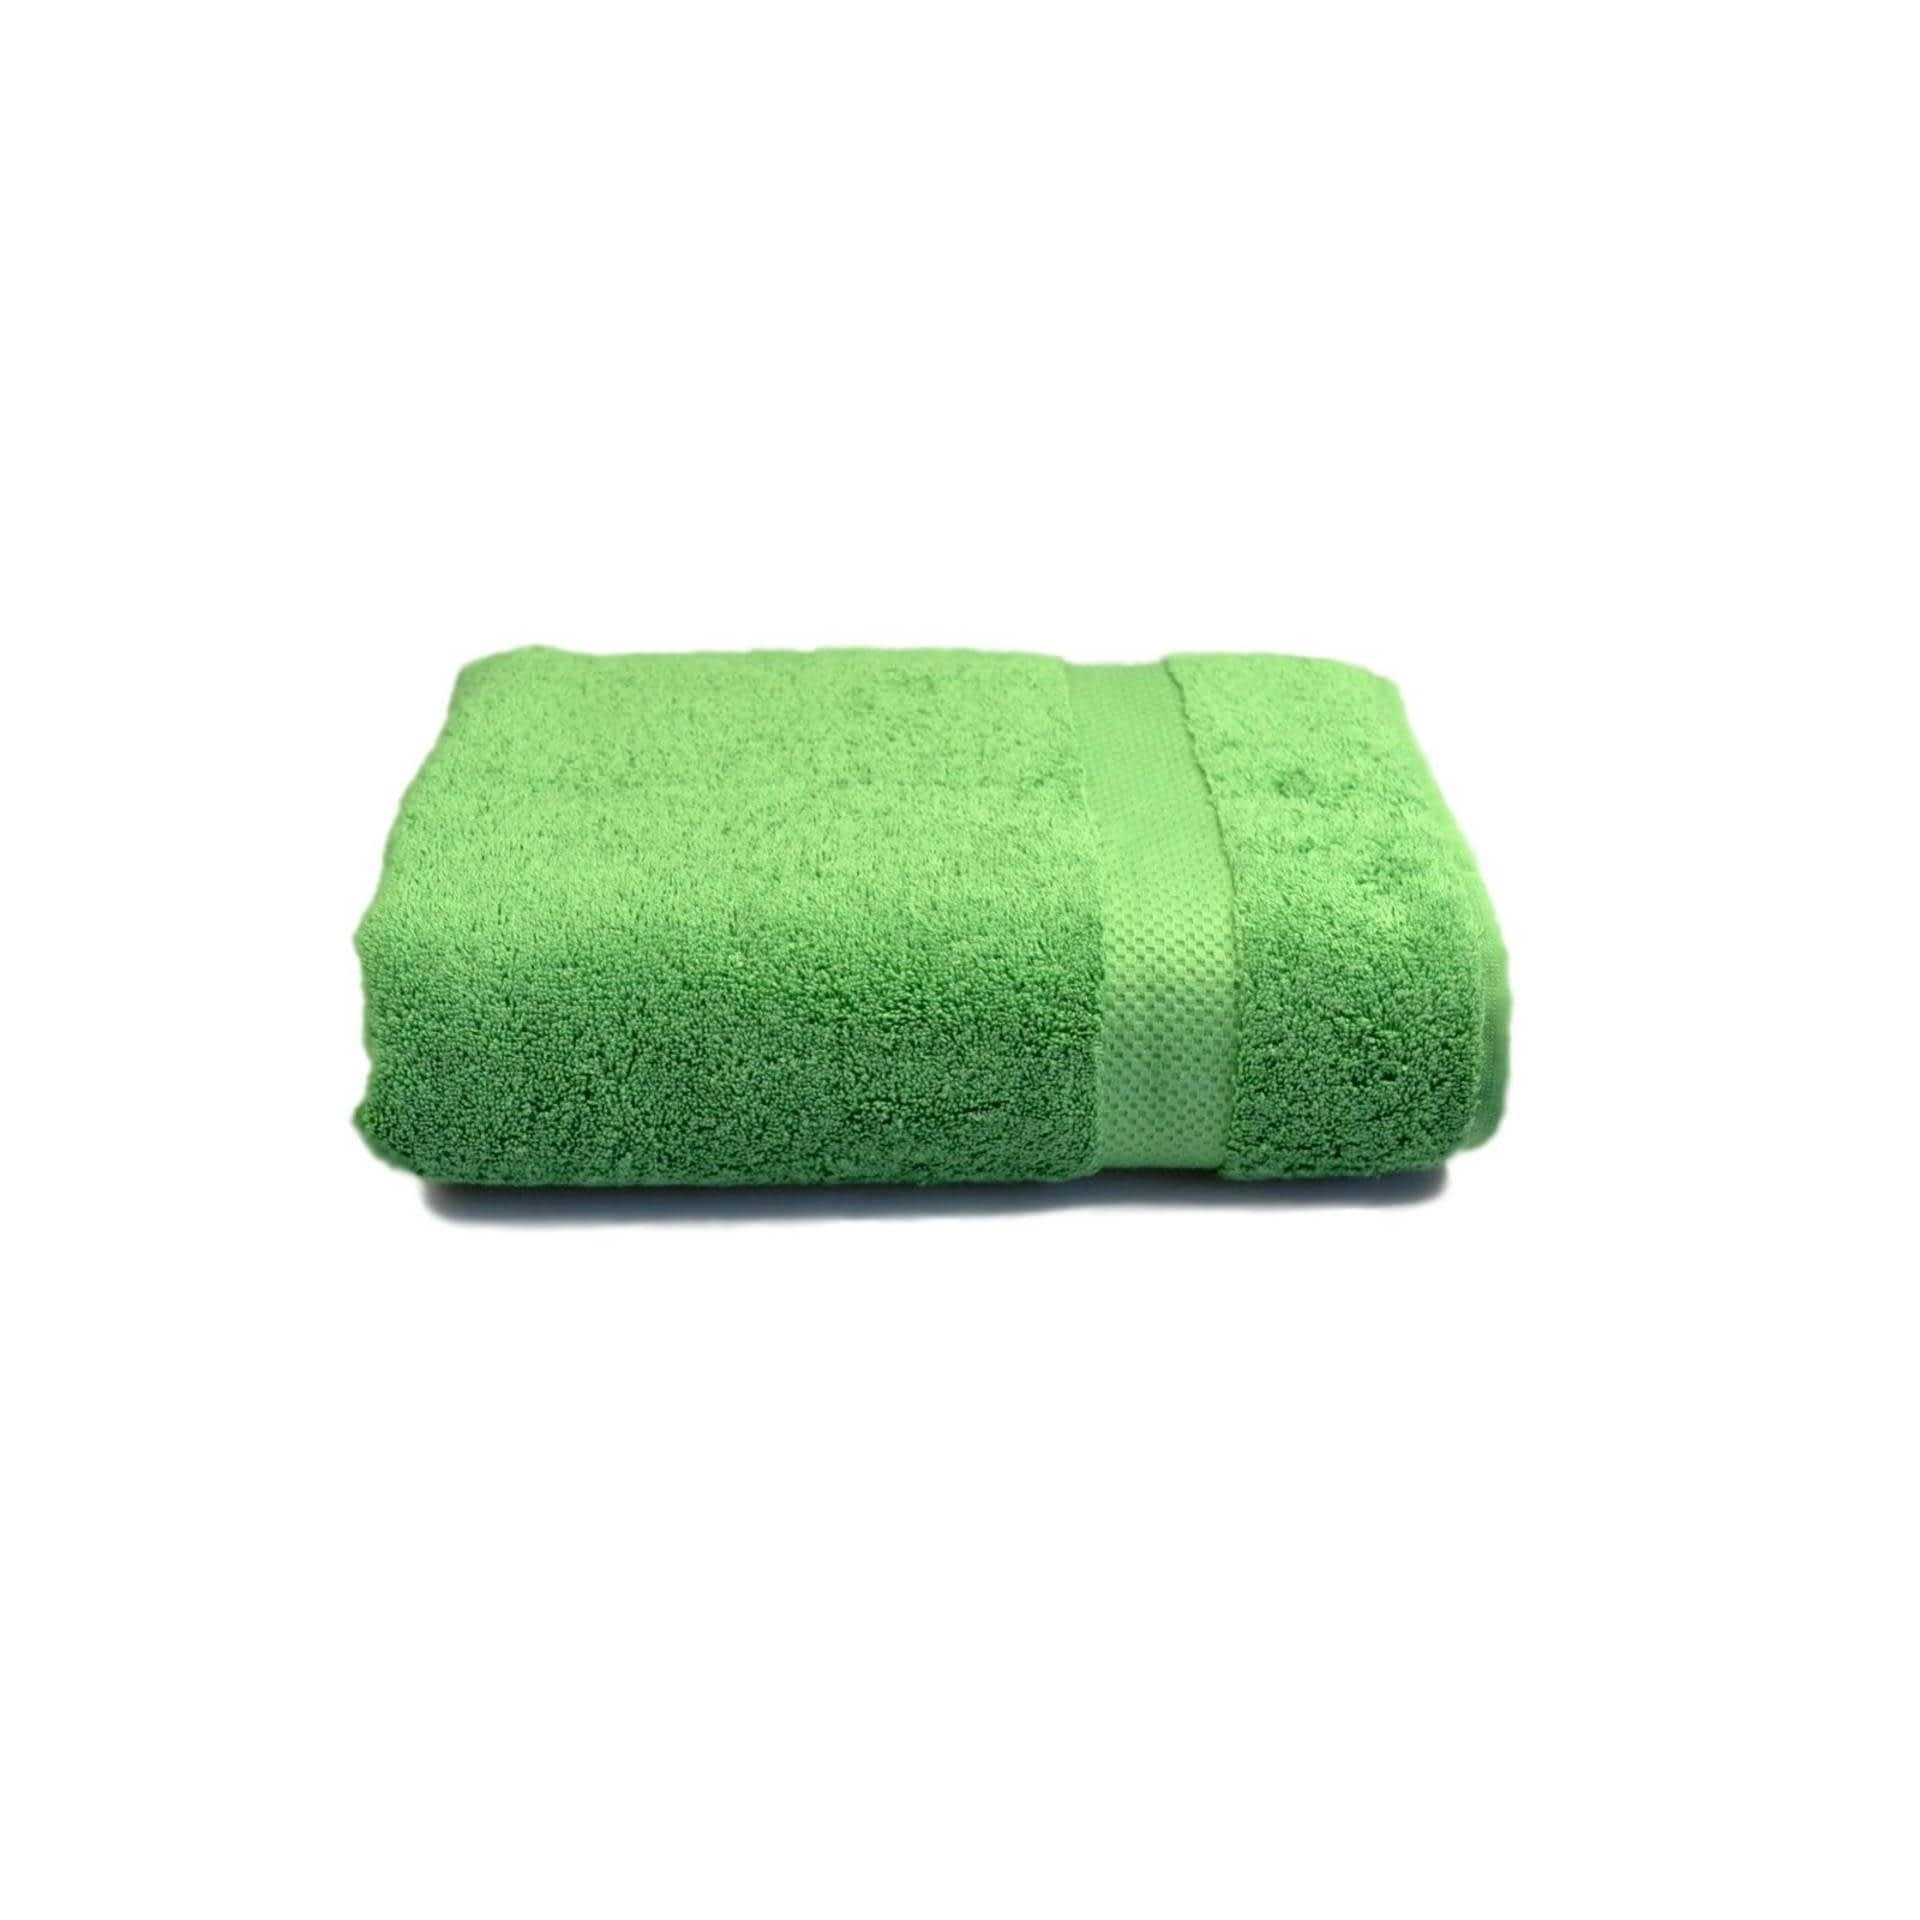 Ткани махровые полотенца - Полотенце махровое зеленое  70х140 см